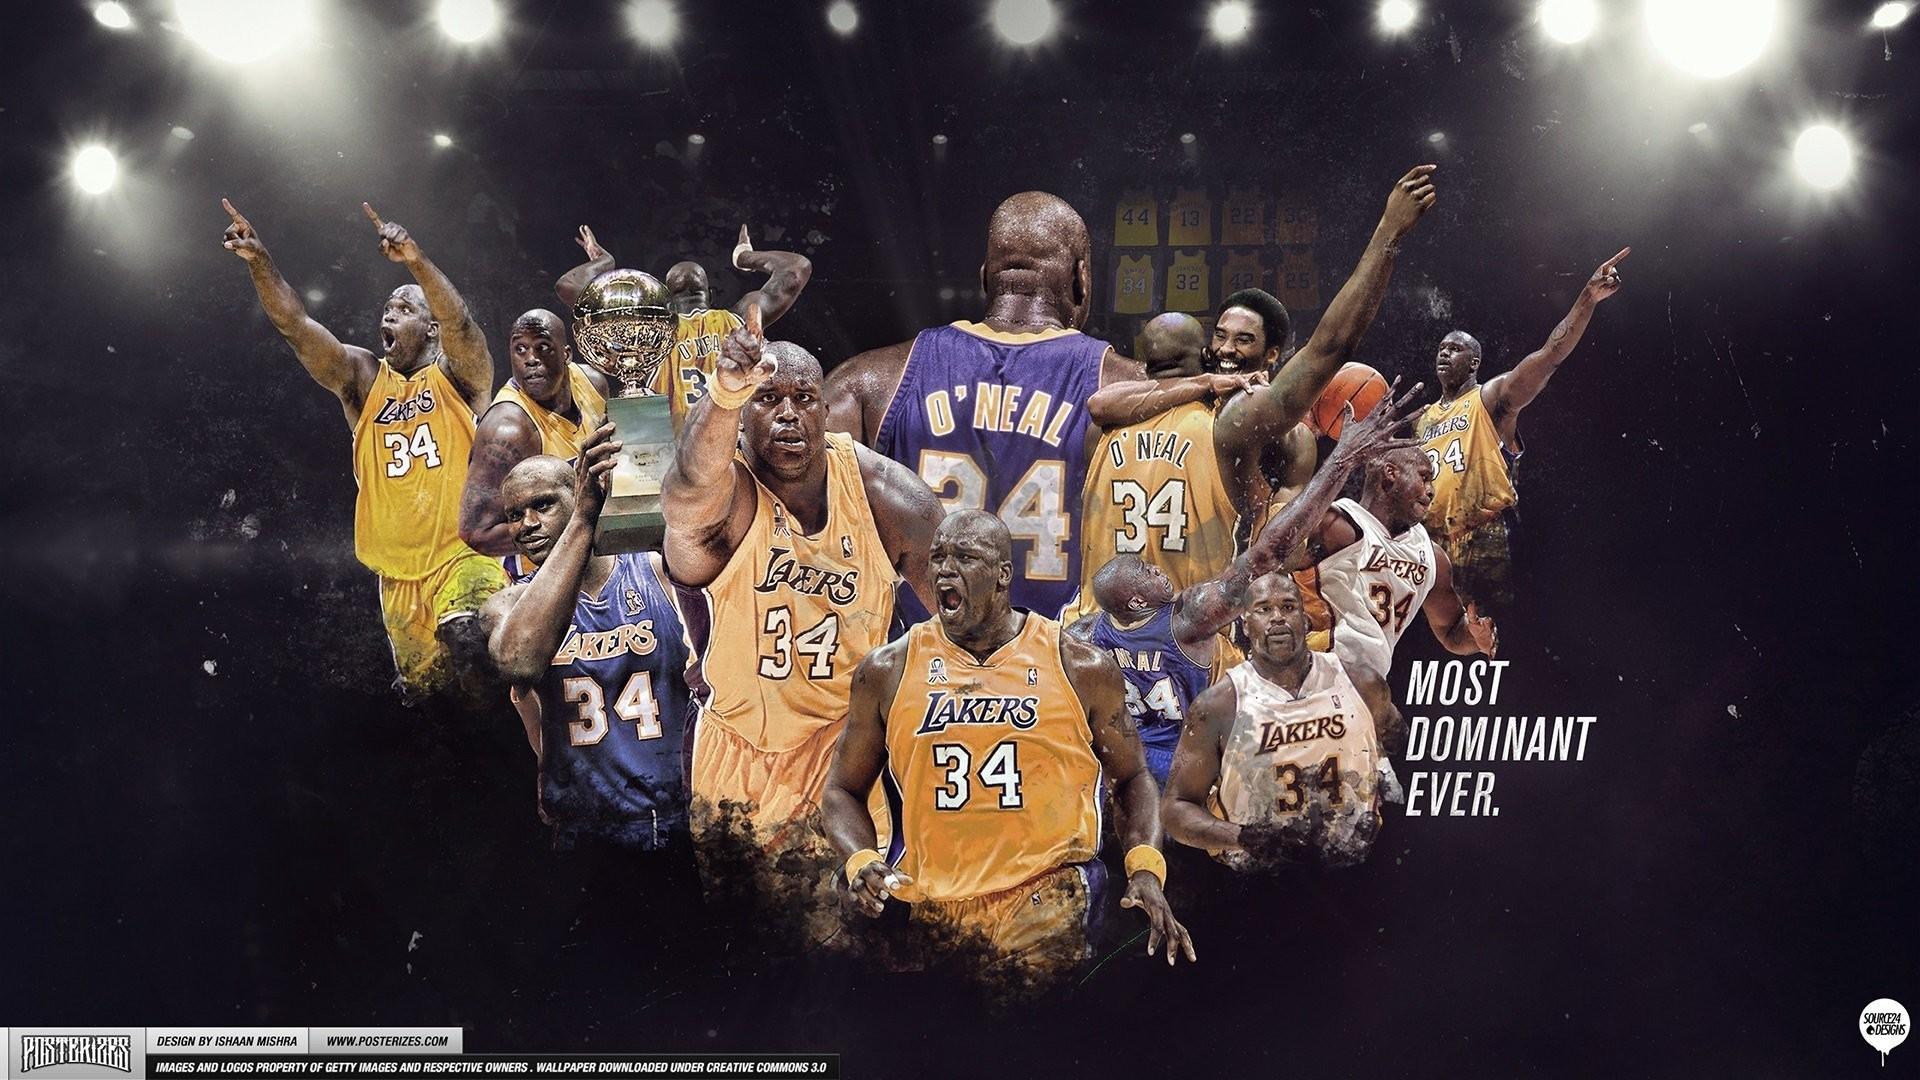 Download Lakers 2020 Roster Wallpaper Cikimmcom 1920x1080